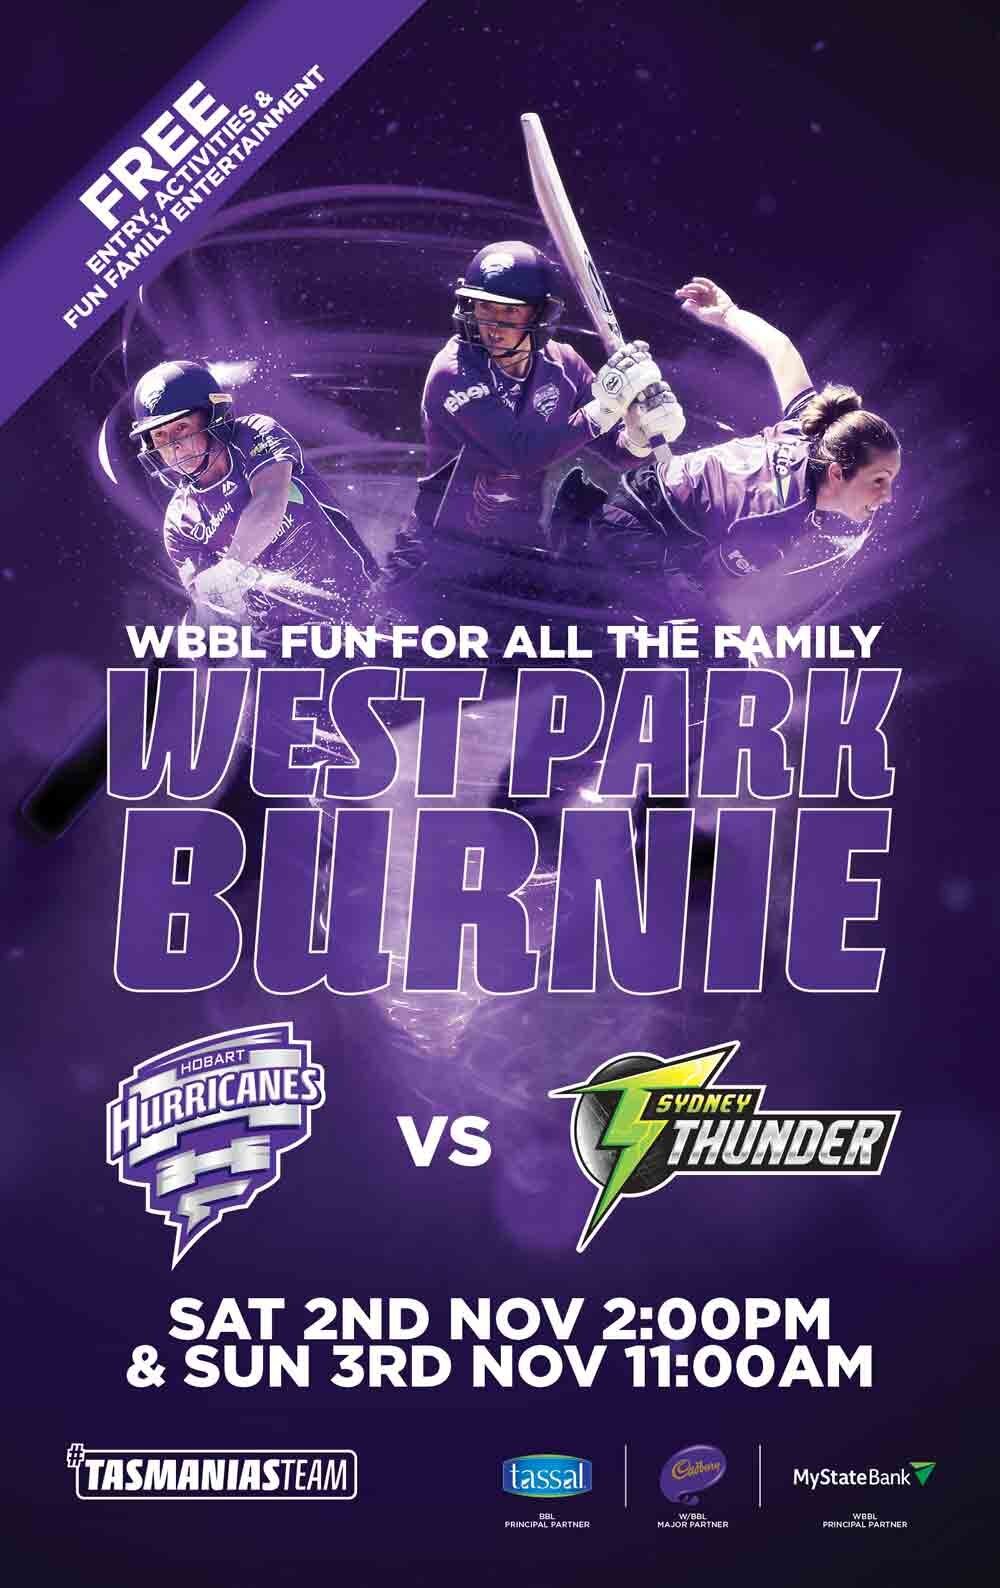 WBBL-Hurricanes-Poster.jpg